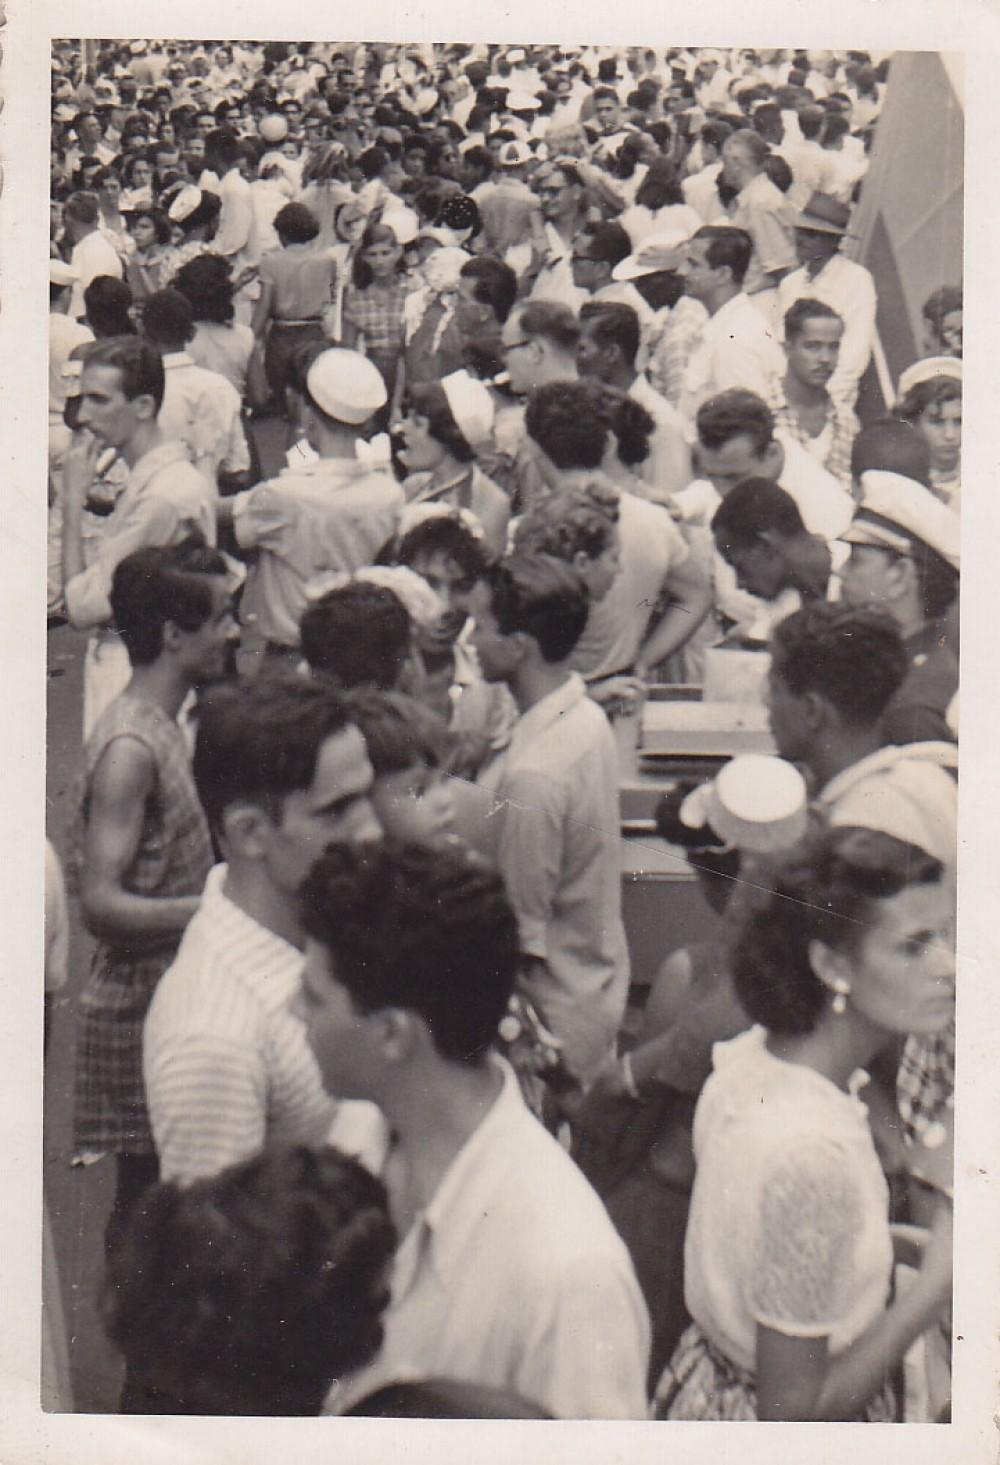 Minia. Brazilija, apie 1946–1950 m.